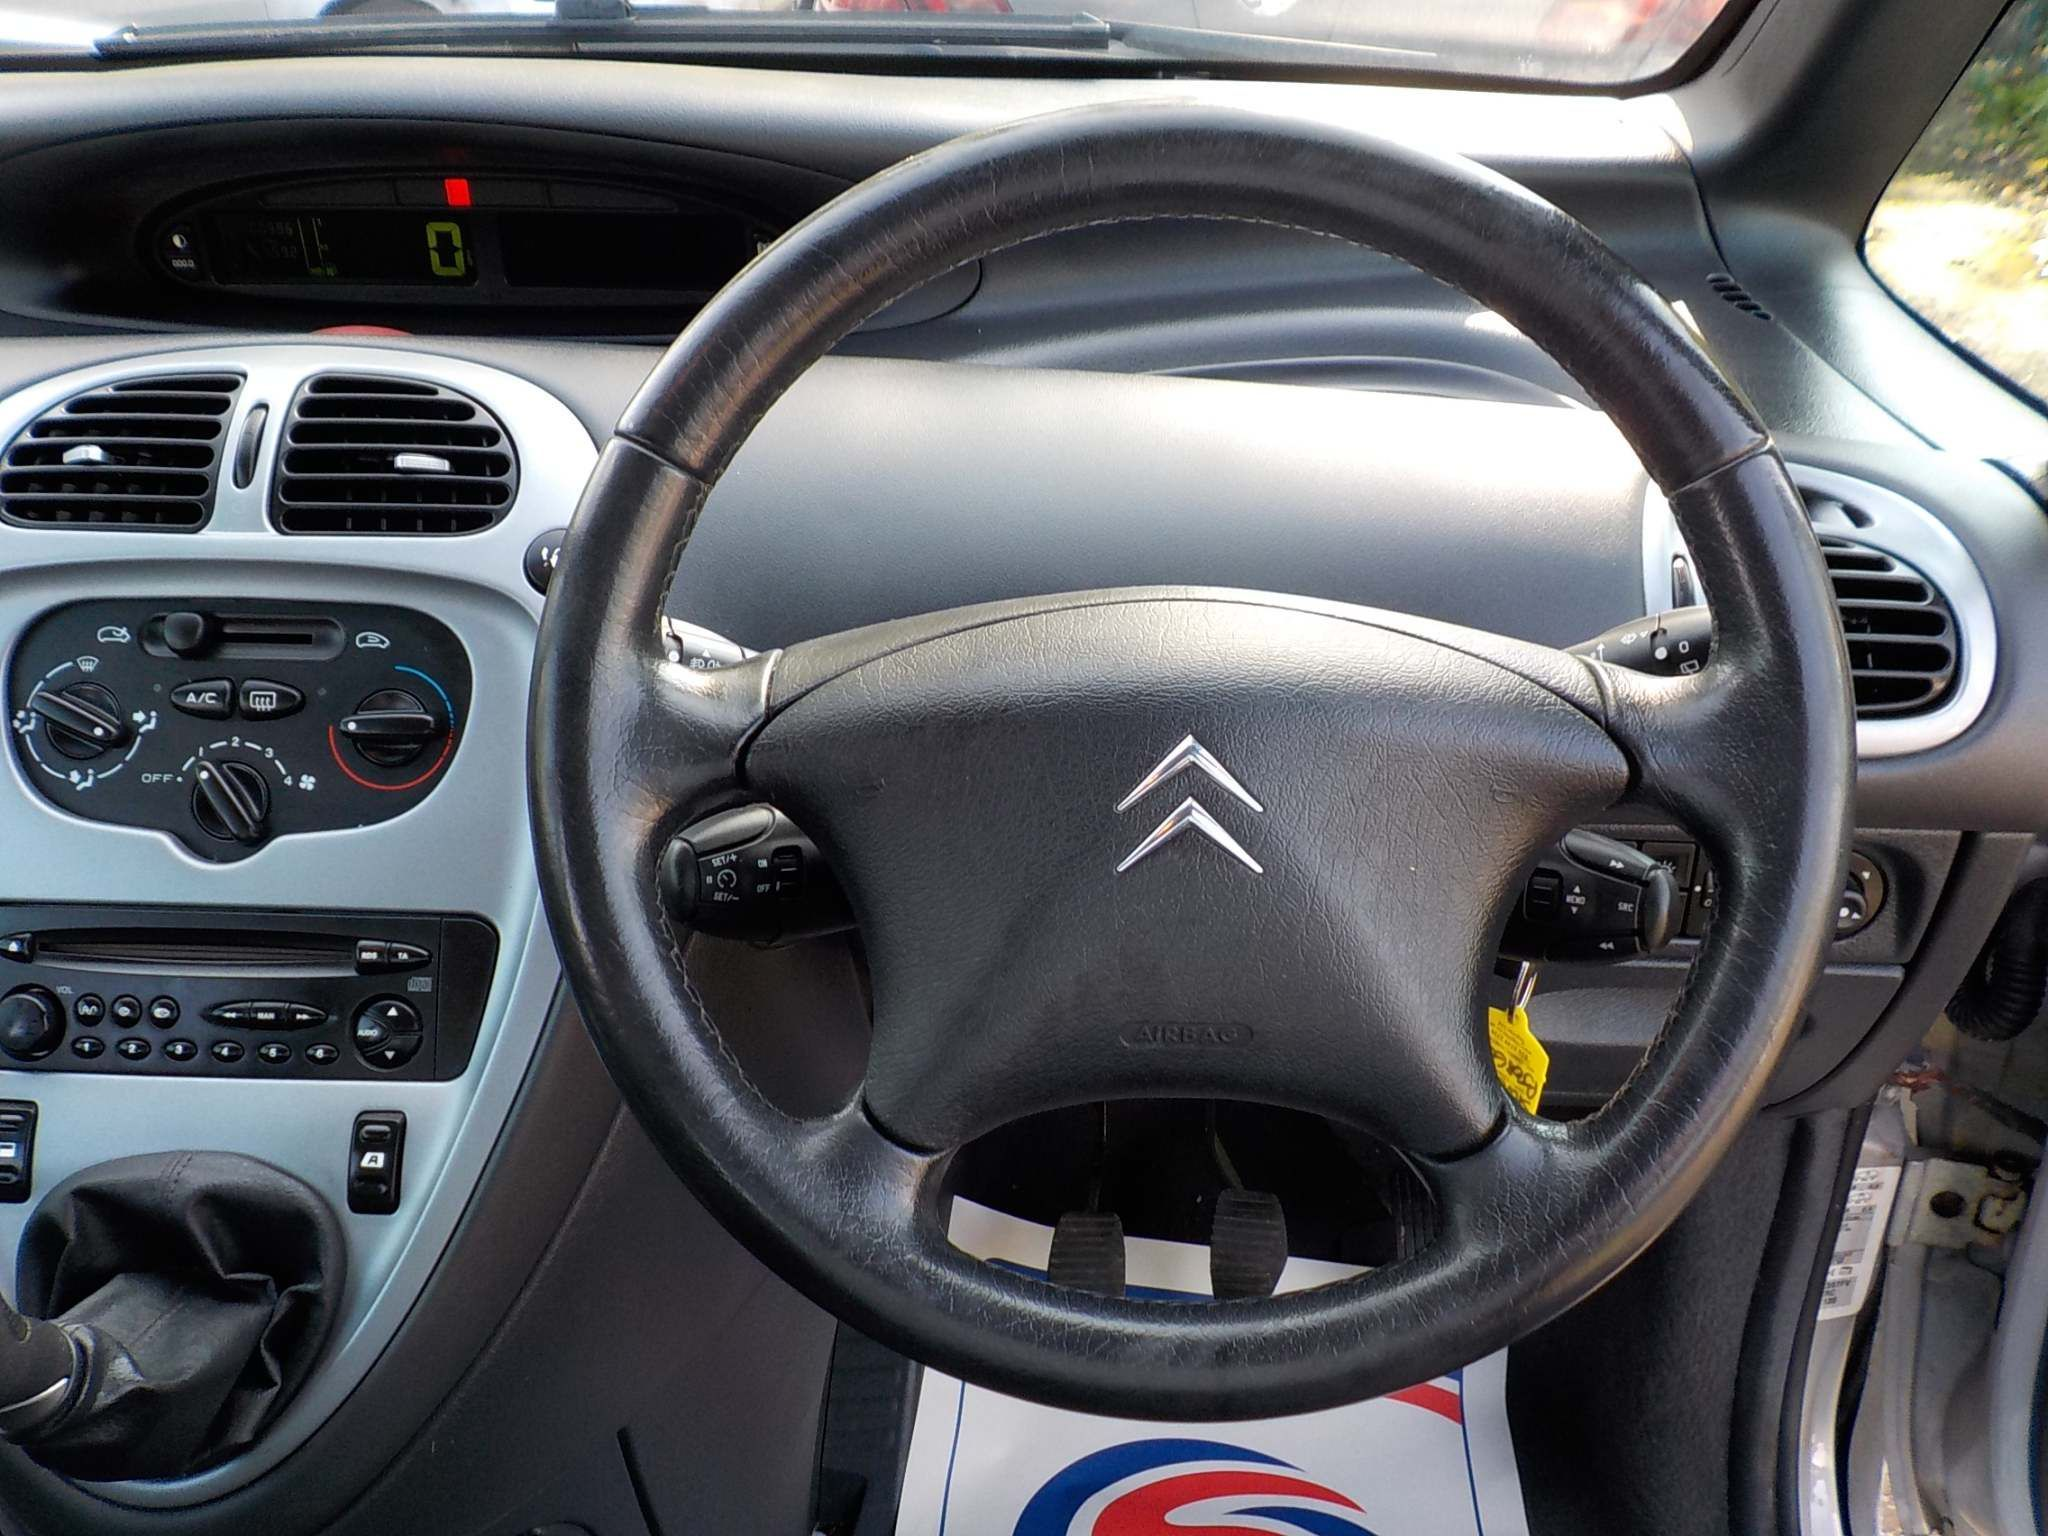 Citroen Xsara Picasso 1.6 HDi VTX 5dr